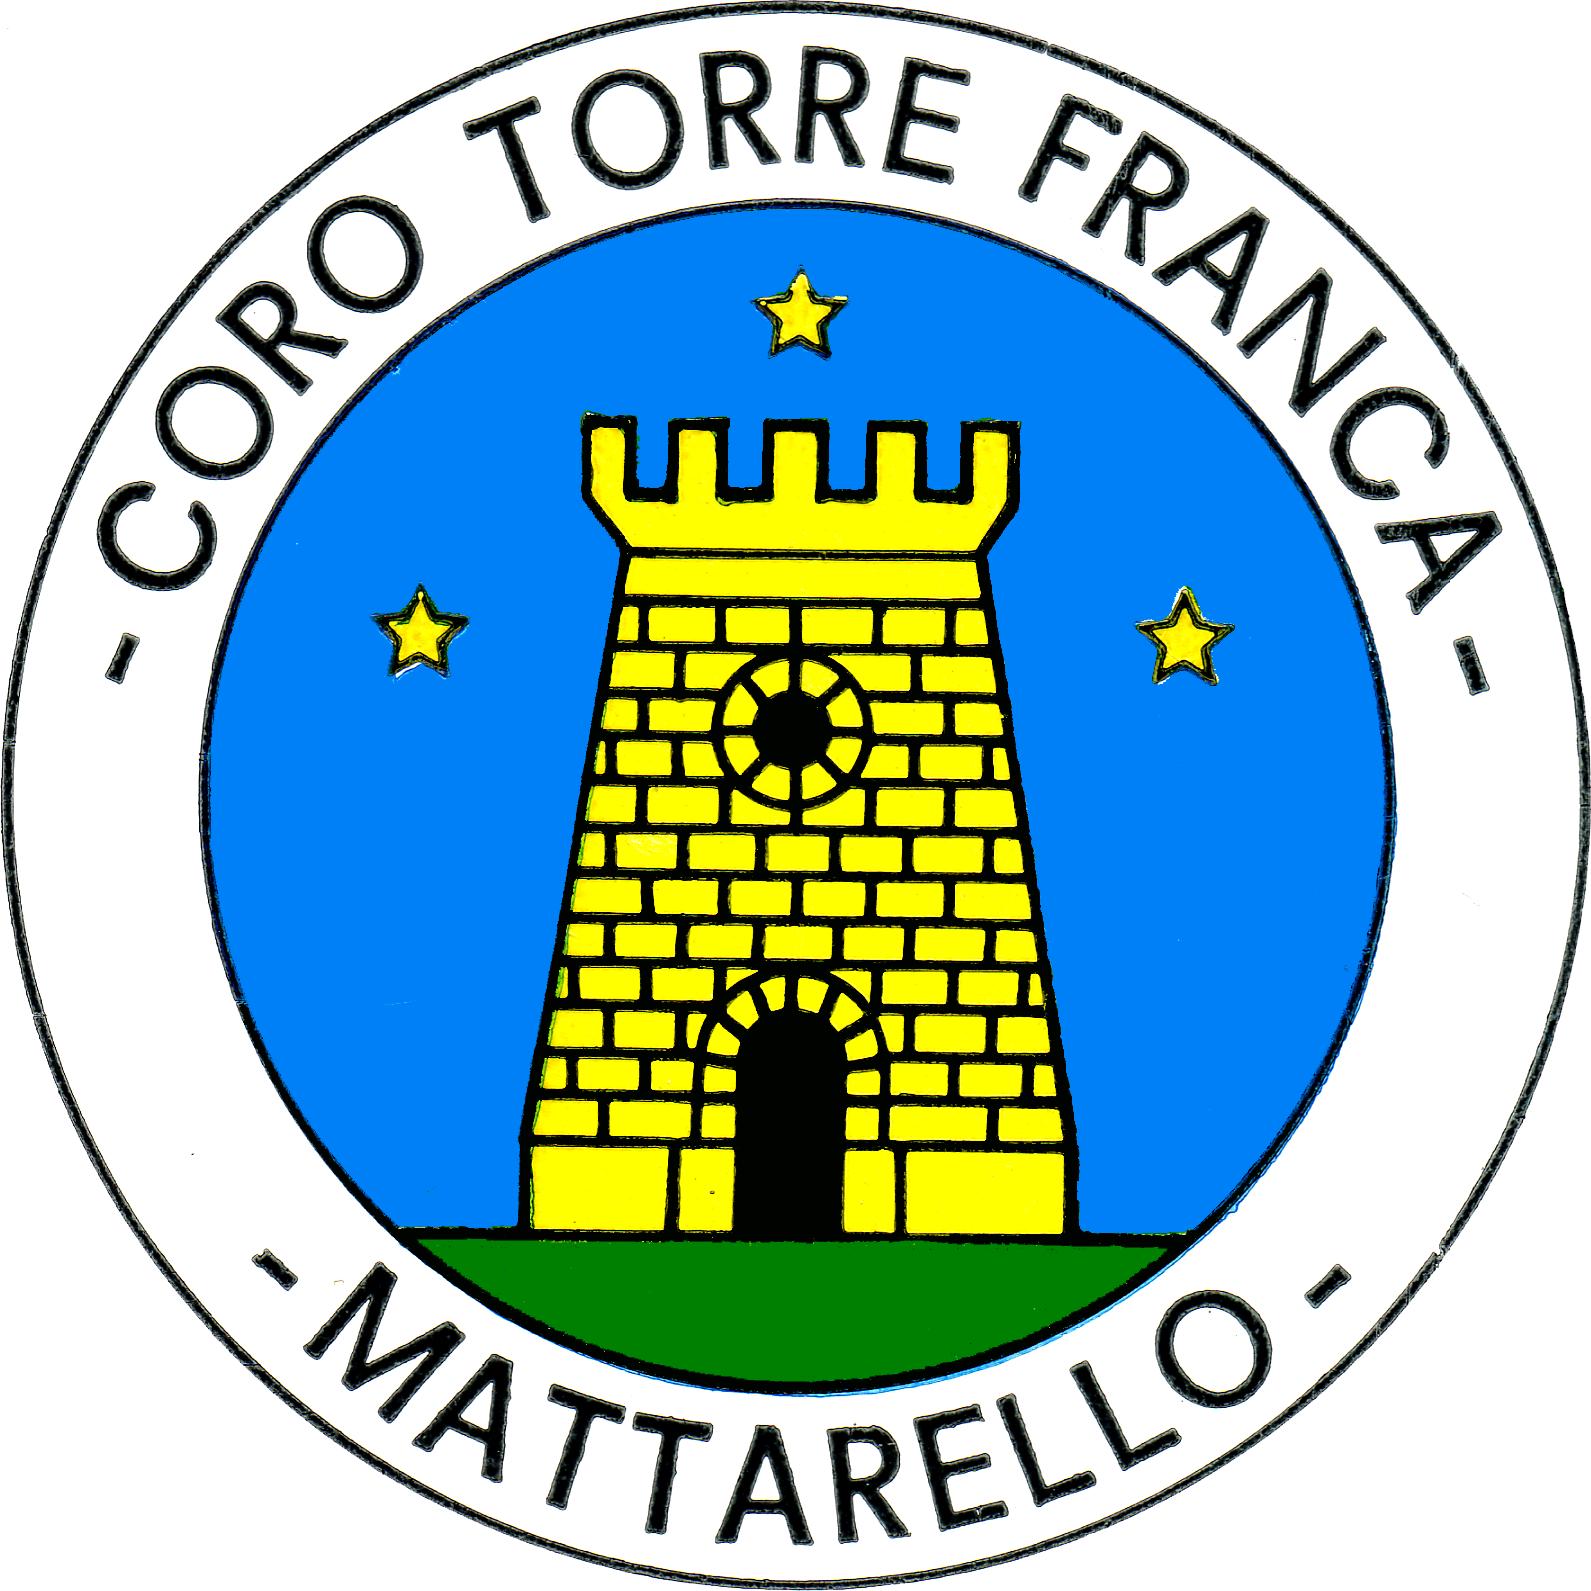 Coro Torre Franca